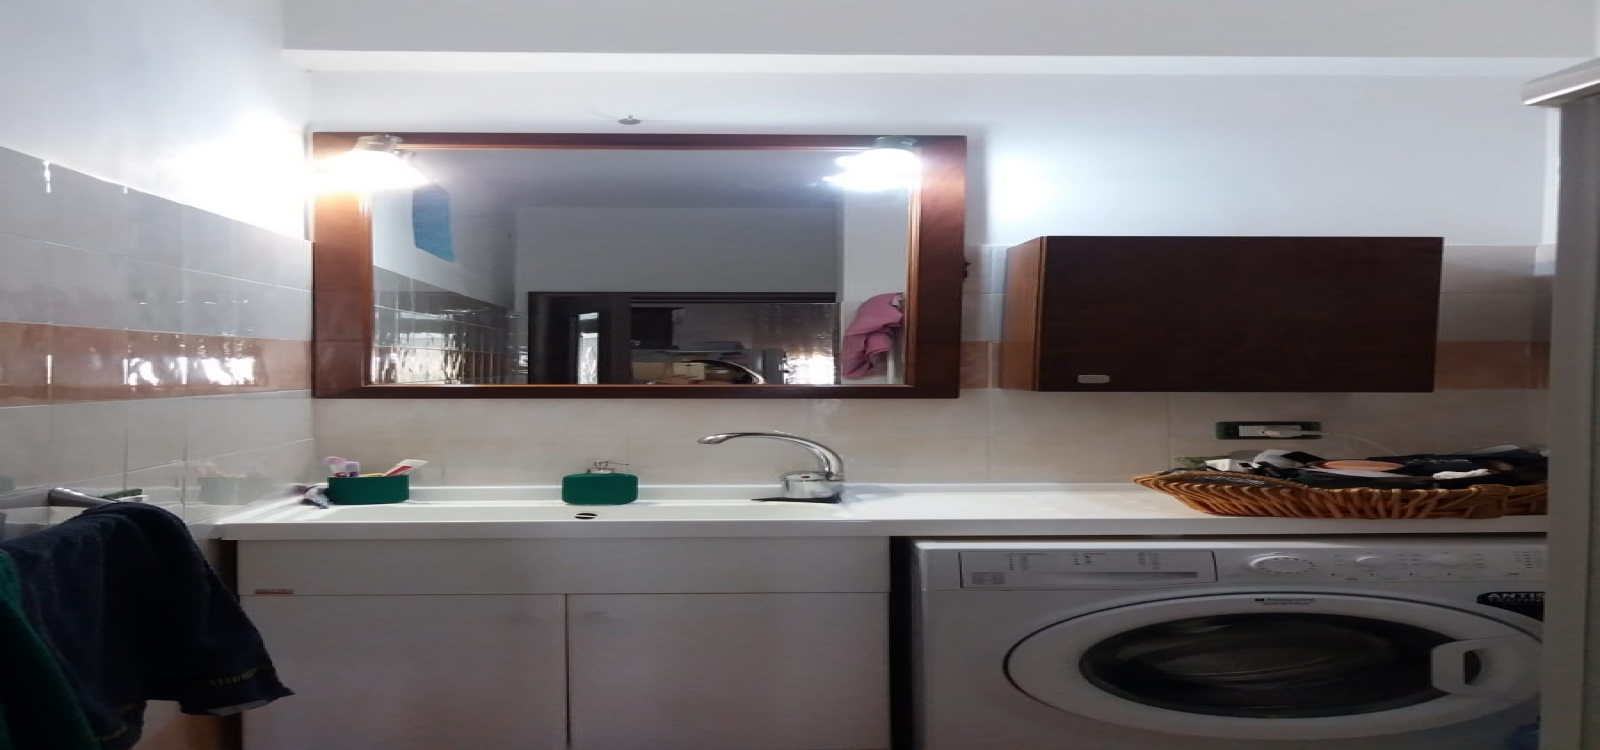 TICA,SIRACUSA,96100,Appartamento,TICA,2168